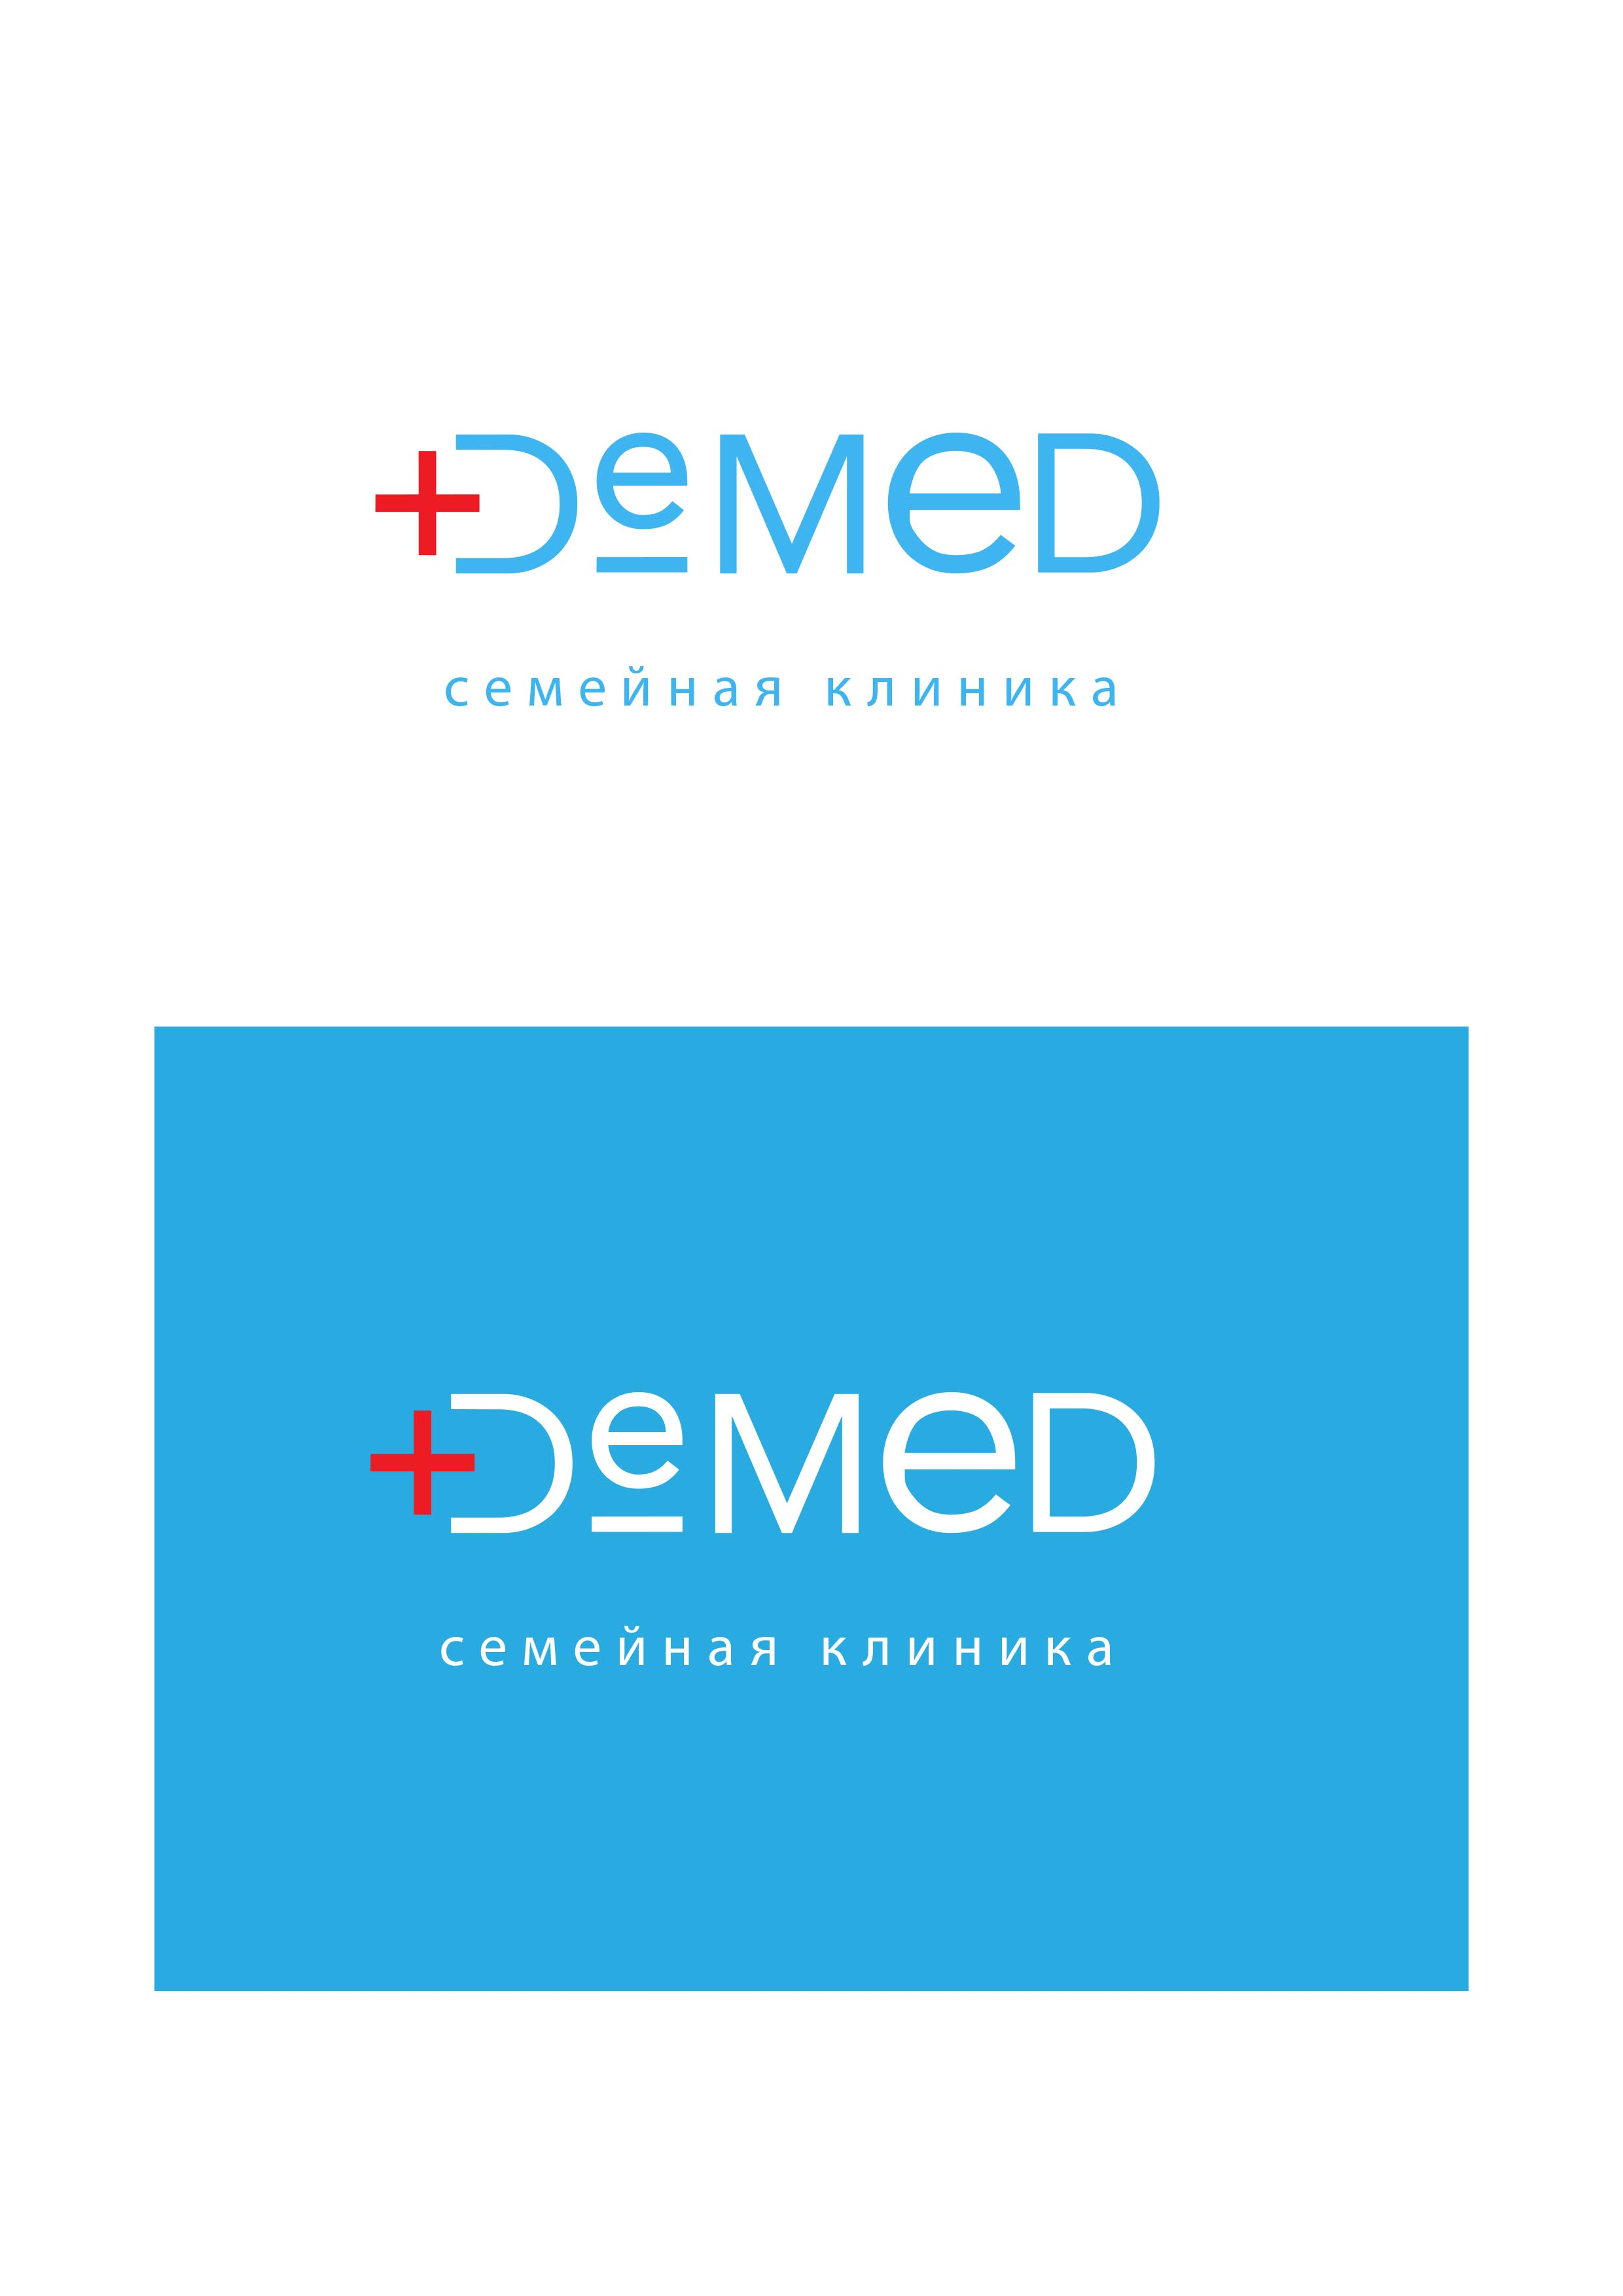 Логотип медицинского центра фото f_2975dc832671c6f4.jpg